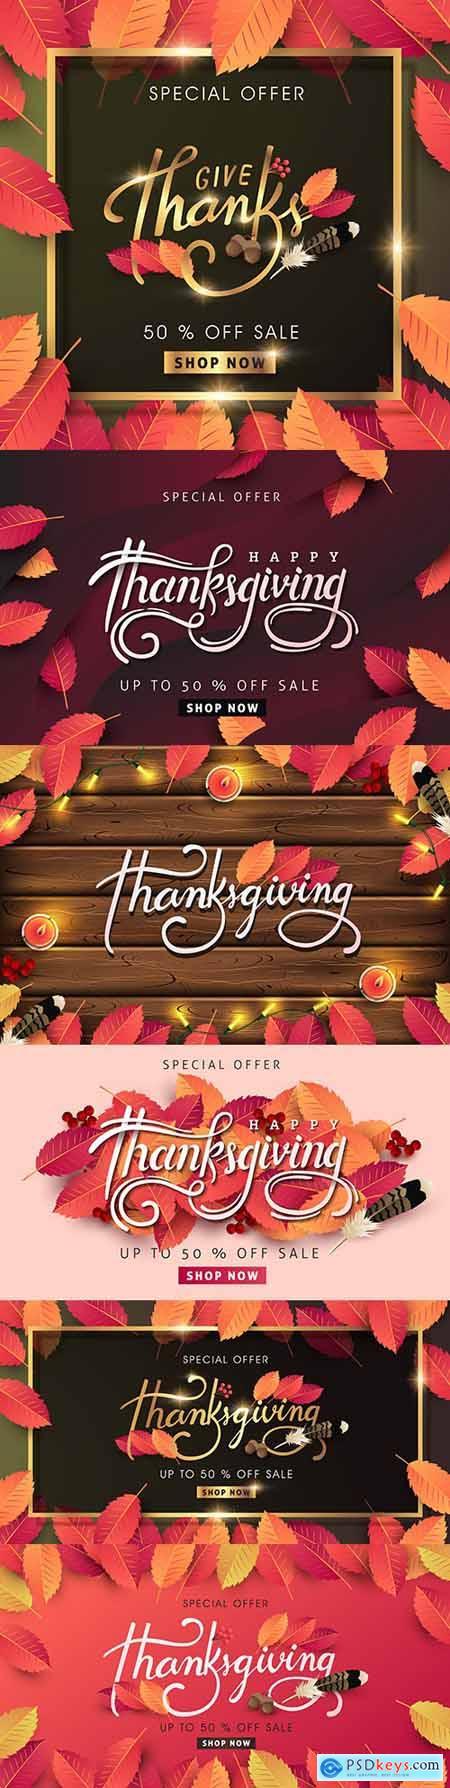 Thanksgiving autumn background calligraphic design inscriptions